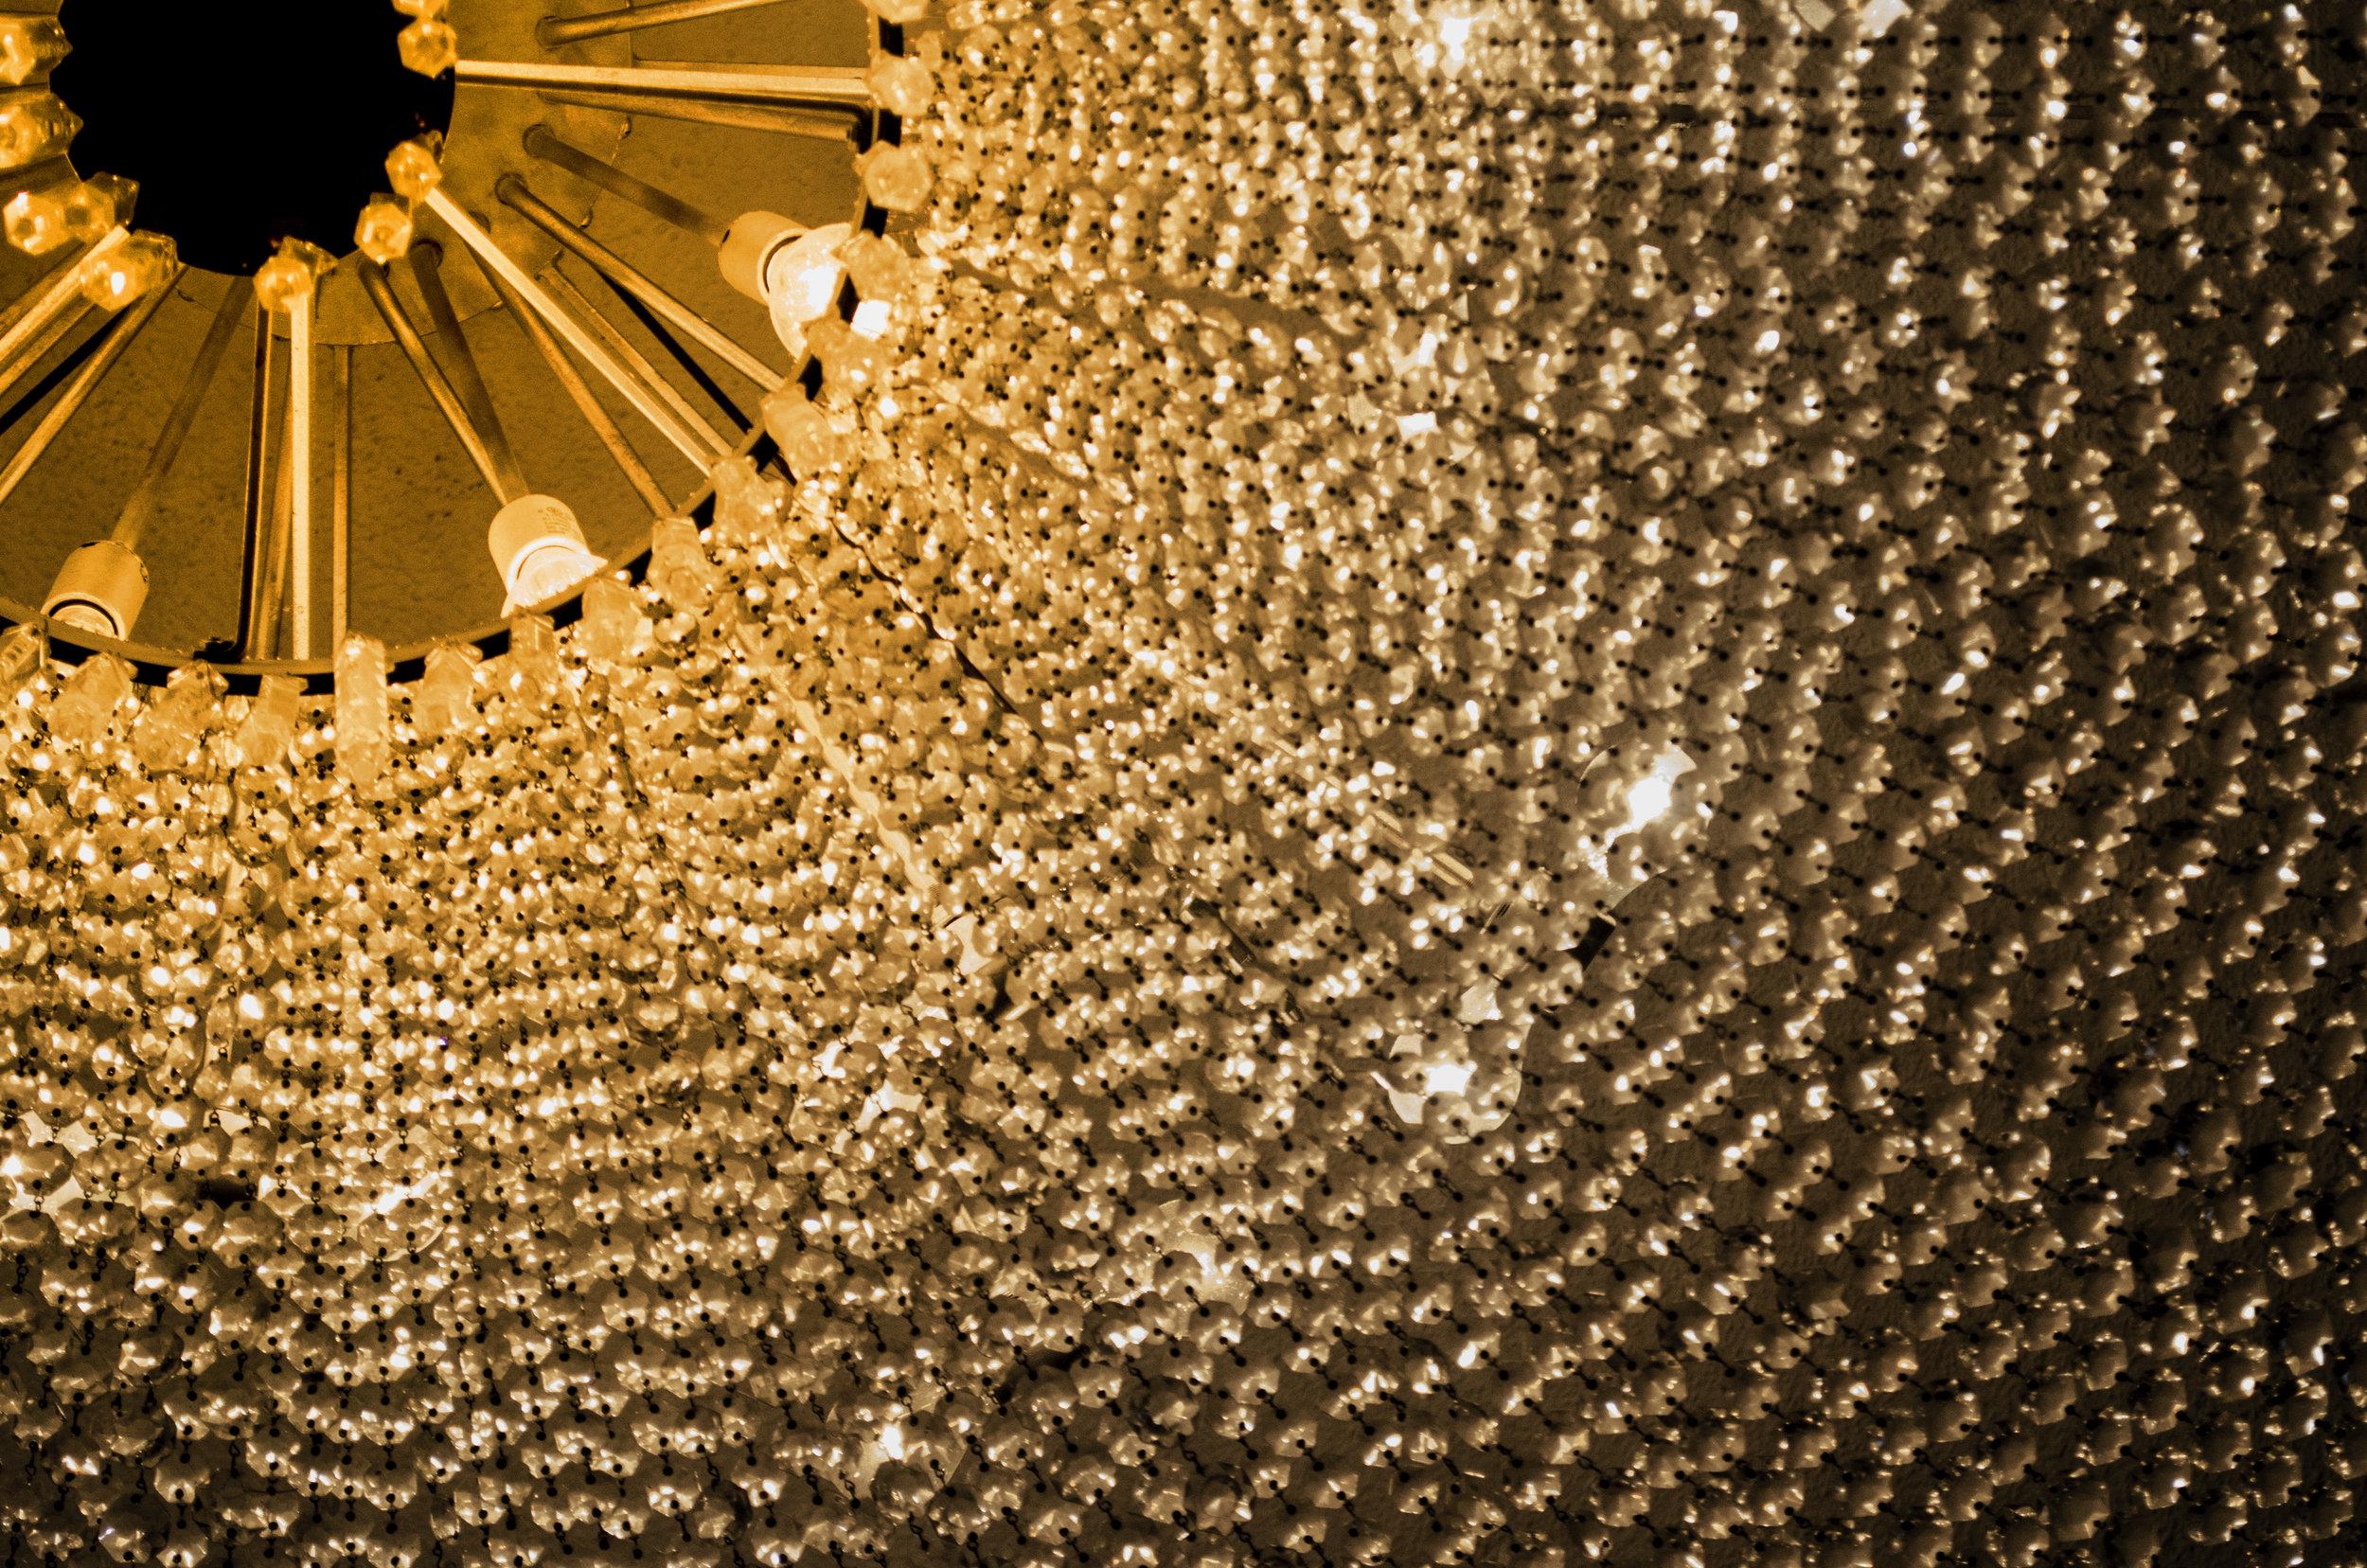 crystal-sun_16055003499_o.jpg